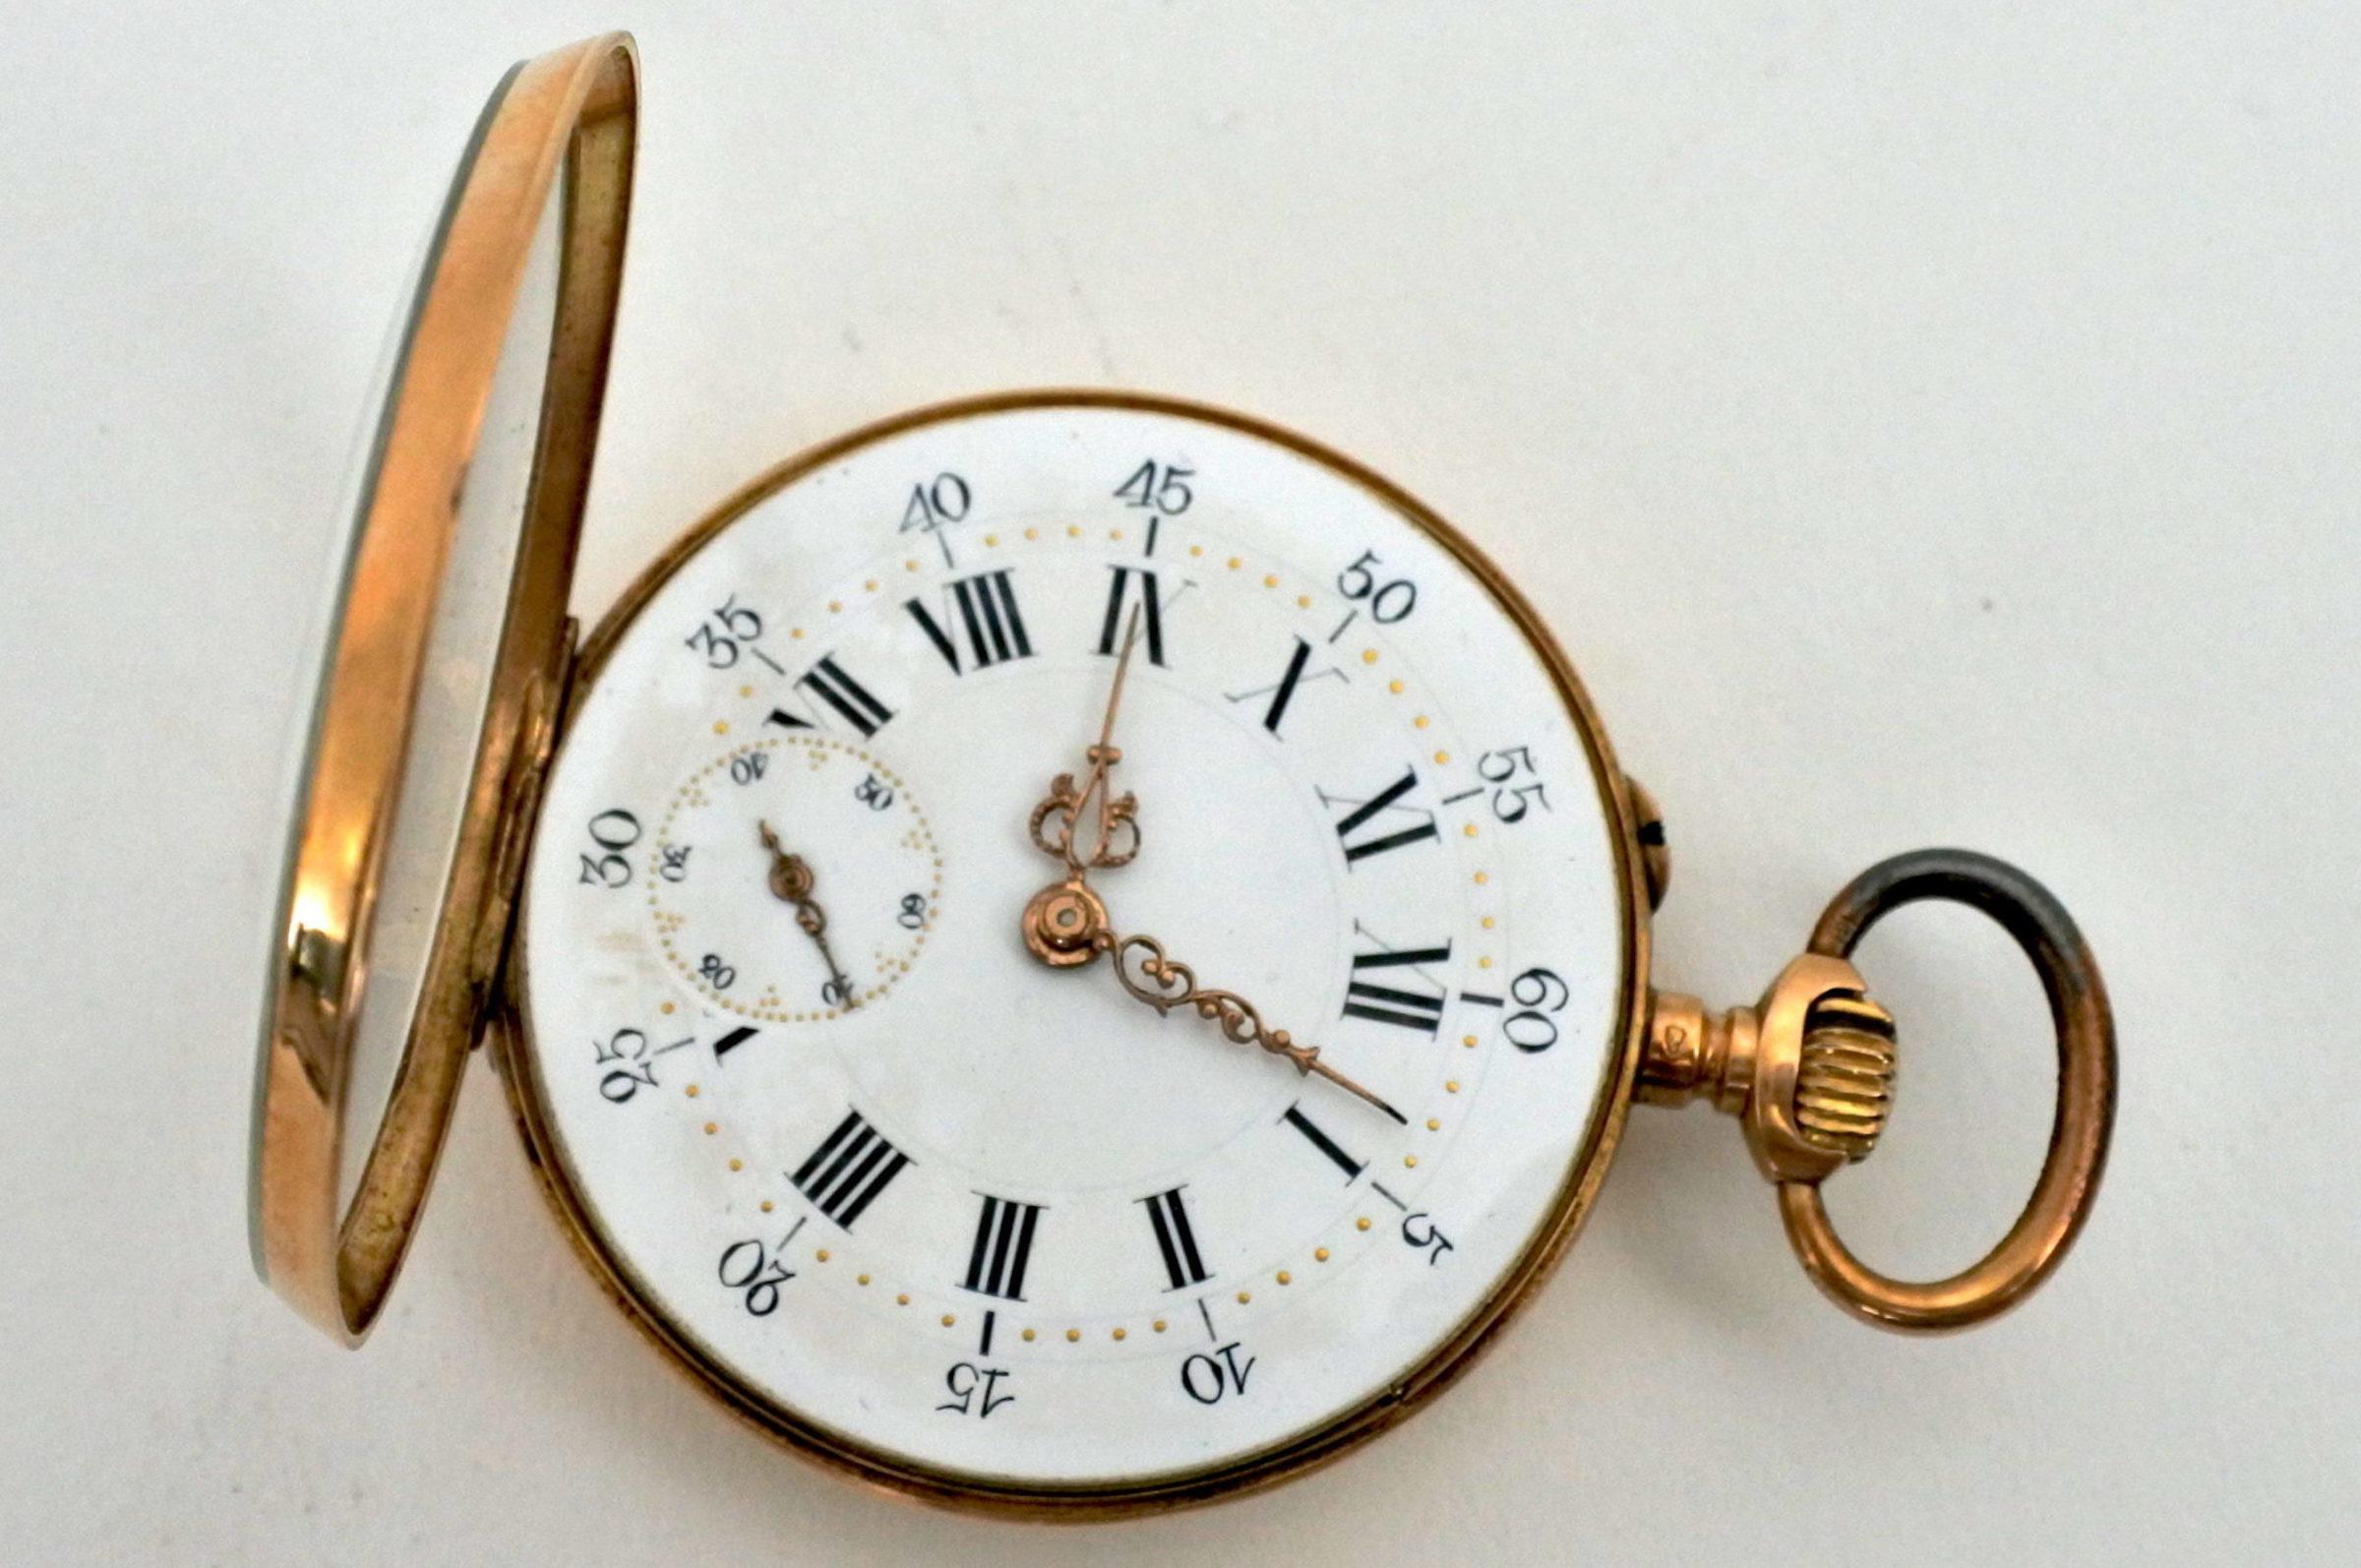 Orologio da tasca in oro - Octave Dupont - 5